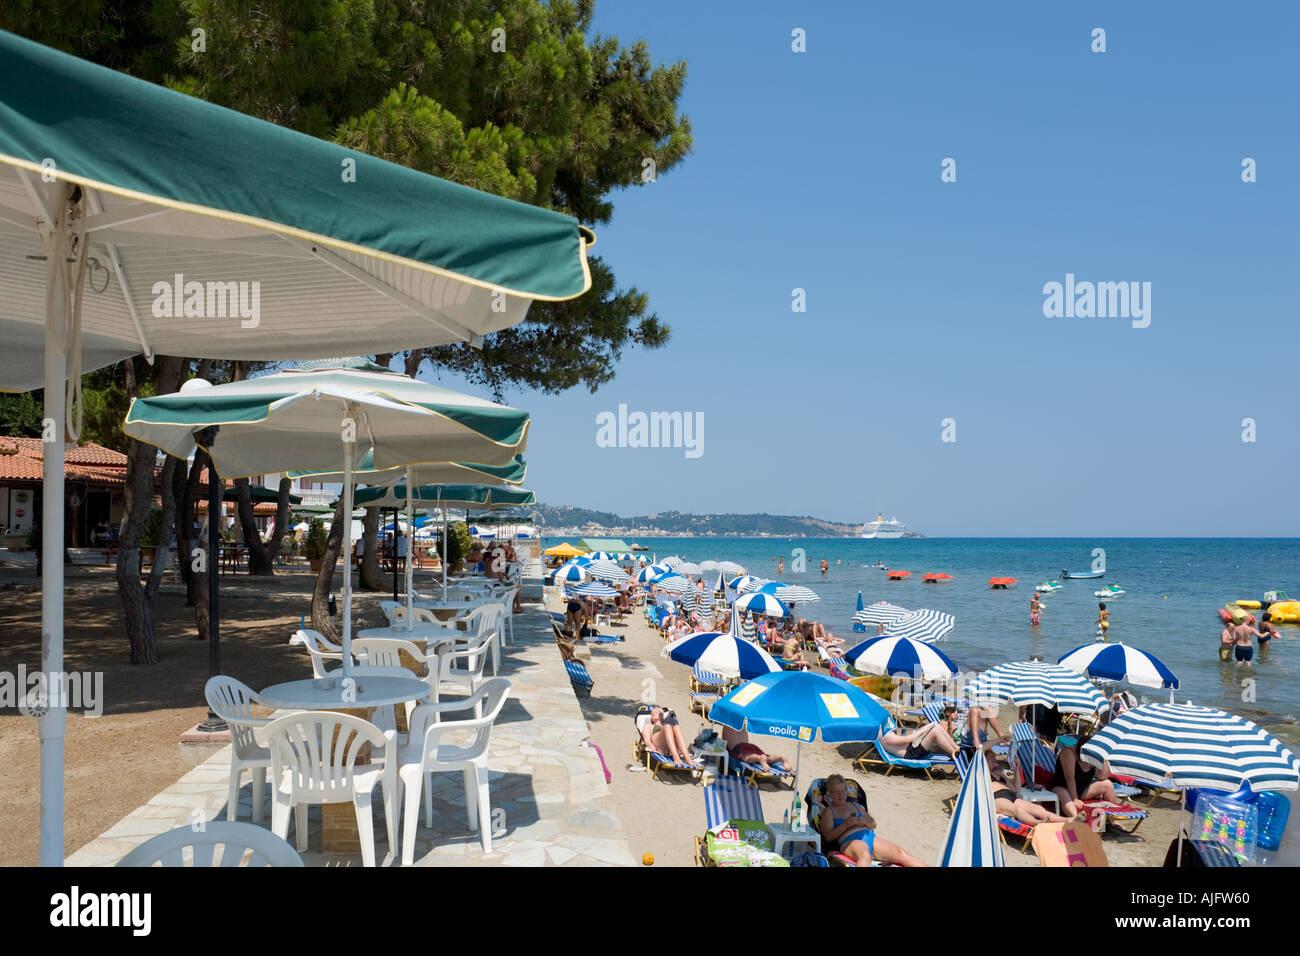 Beachfront Cafe, Argassi, Zakynthos, Ionian Islands, Greece - Stock Image